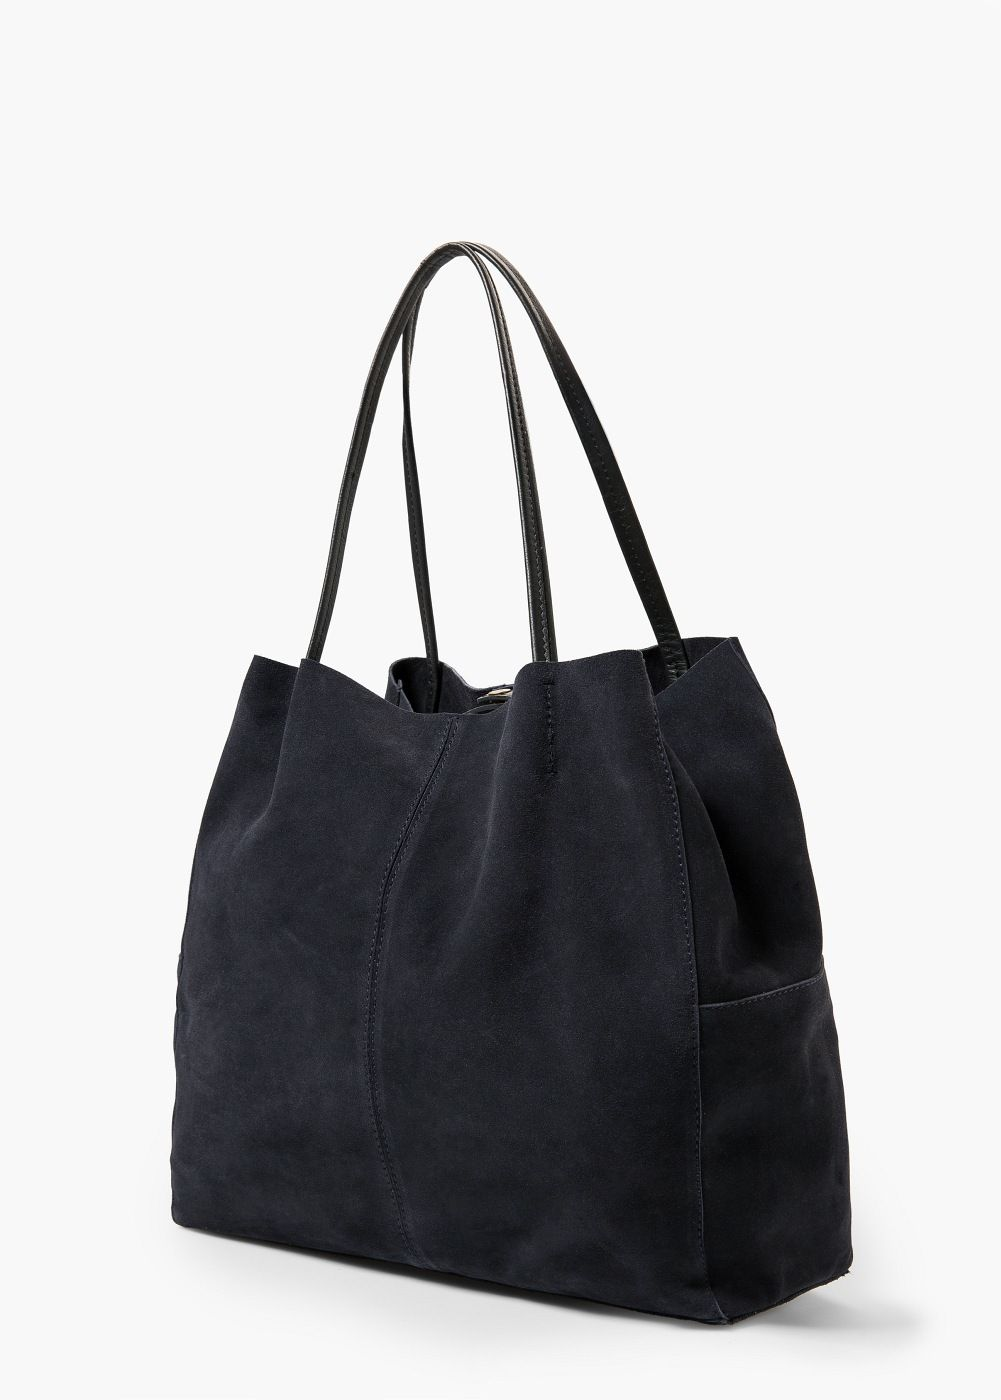 593172ed4 Bolso shopper serraje - Mujer | Tote bag | Pinterest | Bolso shopper ...